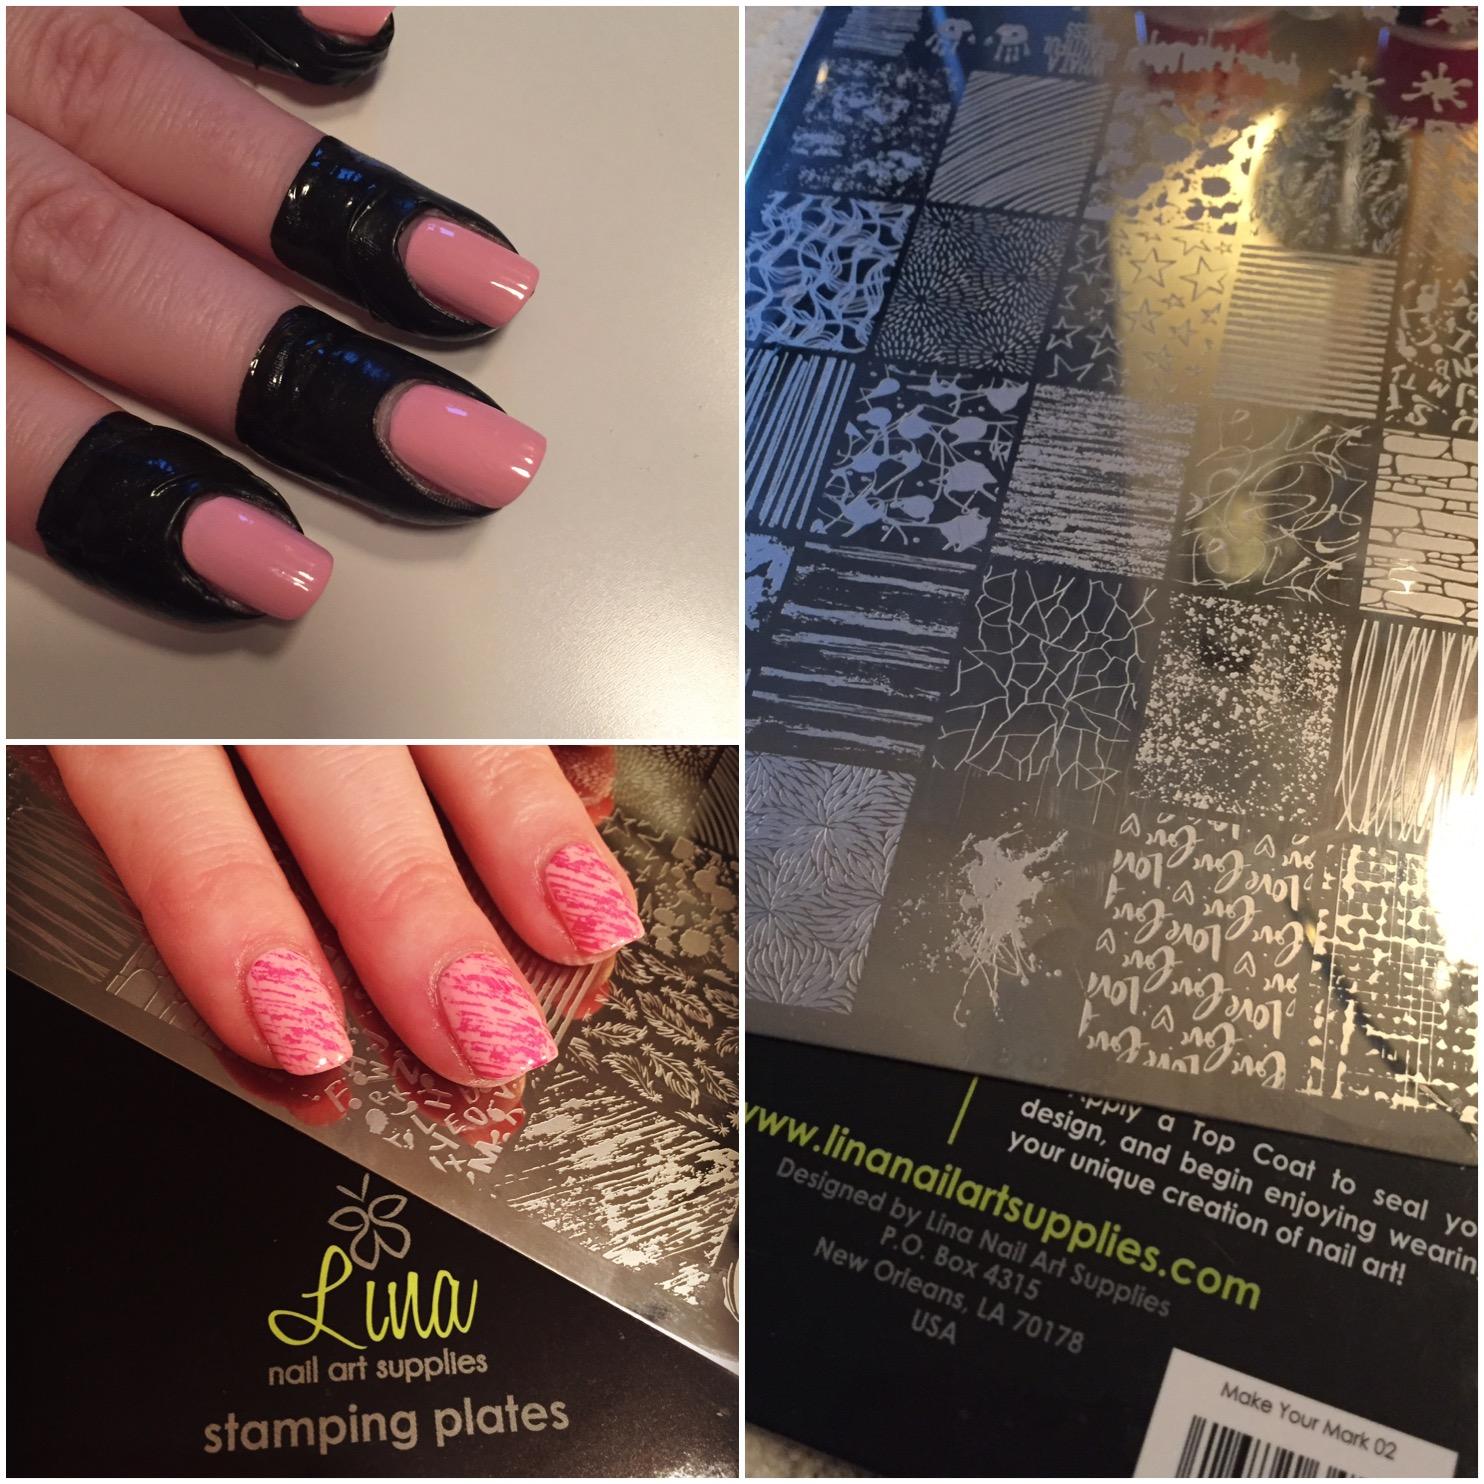 Stamping Plates Lina Nail Art Supplies Carola De Zeeuw